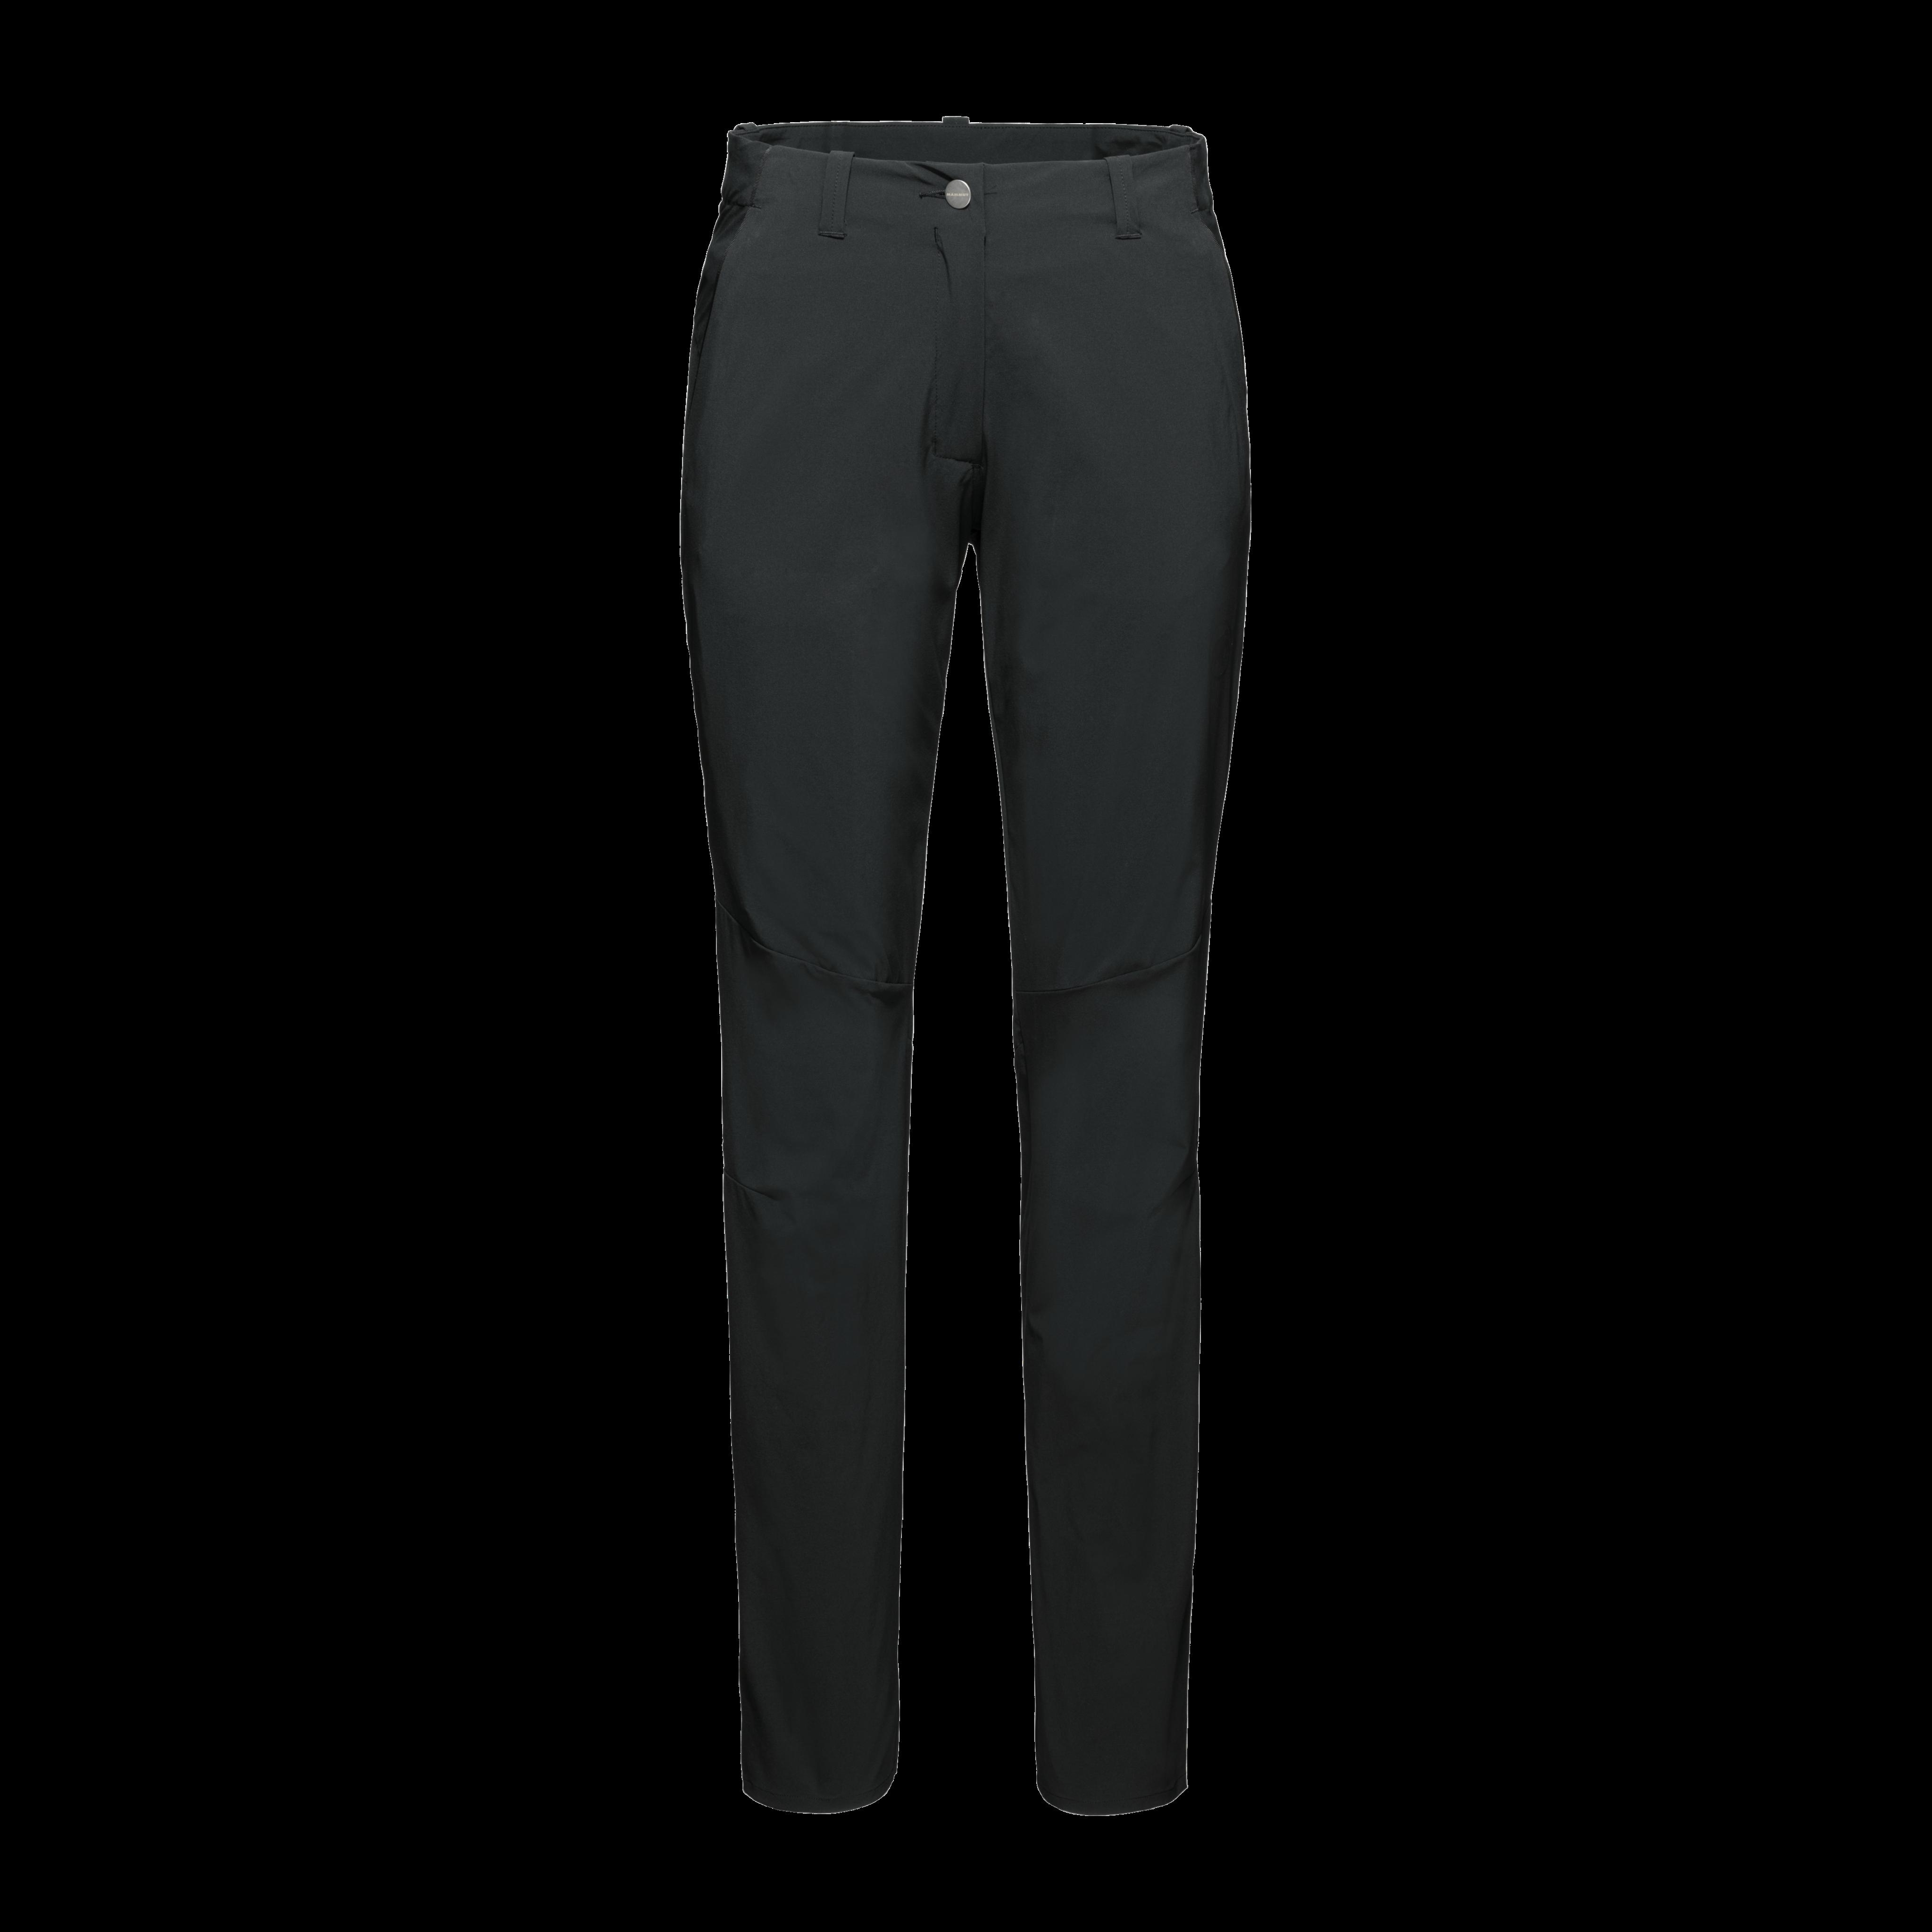 Runbold Pants Women - black, long, UK 18 thumbnail